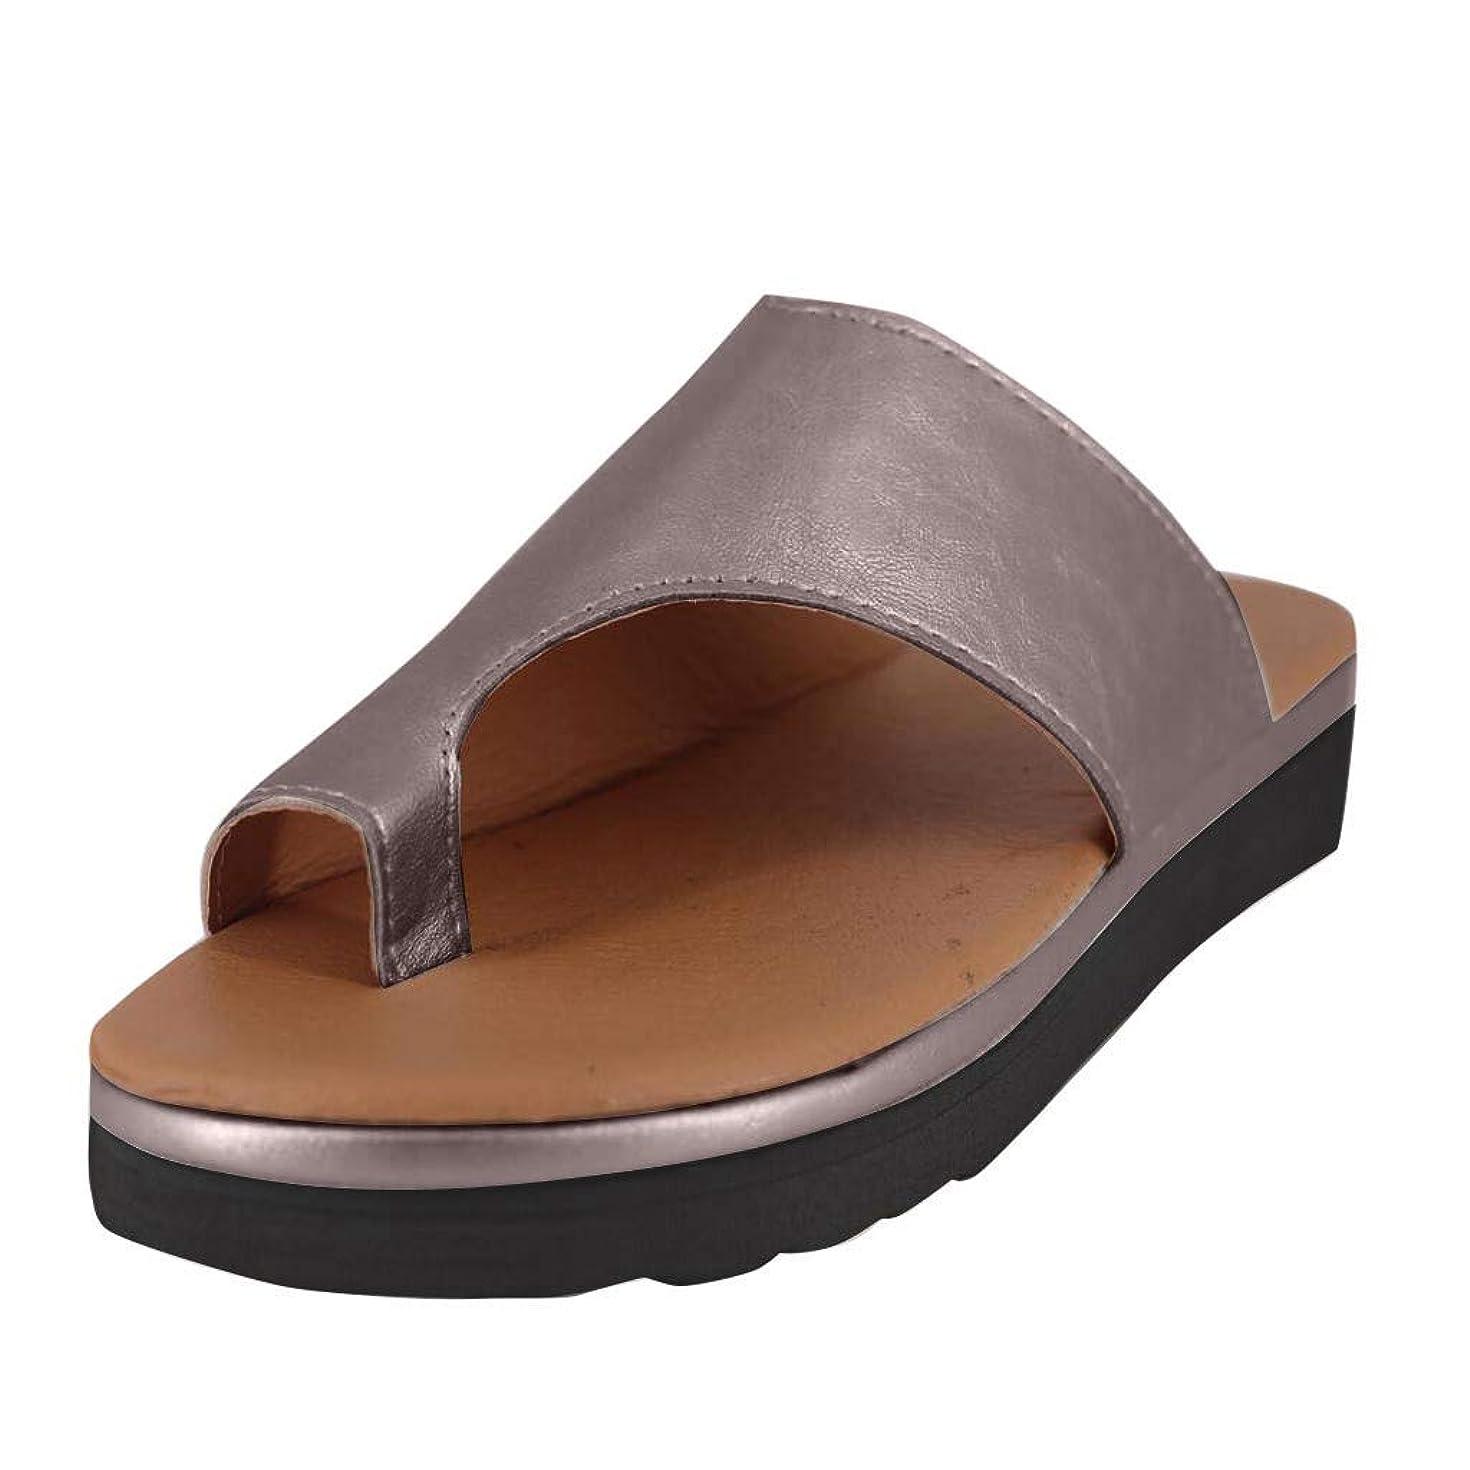 HAALIFE??Women's Sandals 2019 New Women Comfy Platform Sandal Shoes Summer Beach Travel Shoes Fashion Sandal Ladies Shoes